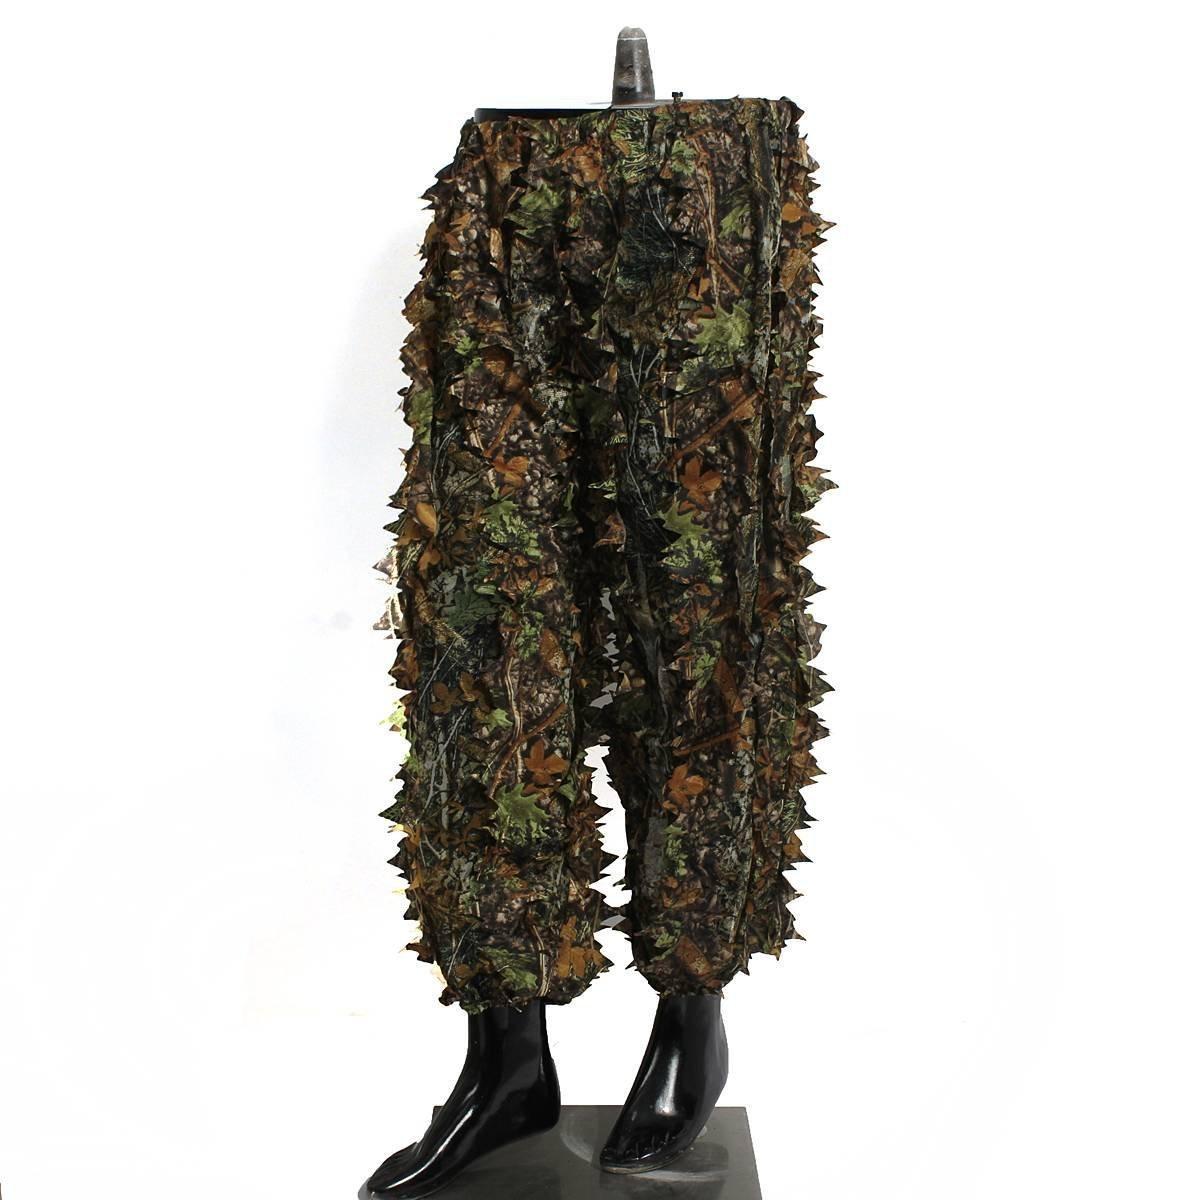 ad4716cbff23b Amazon.com : Boshen Woodland Camo Ghillie Suit 3D Camouflage Jungle Hunting  Clothing Set : Sports & Outdoors